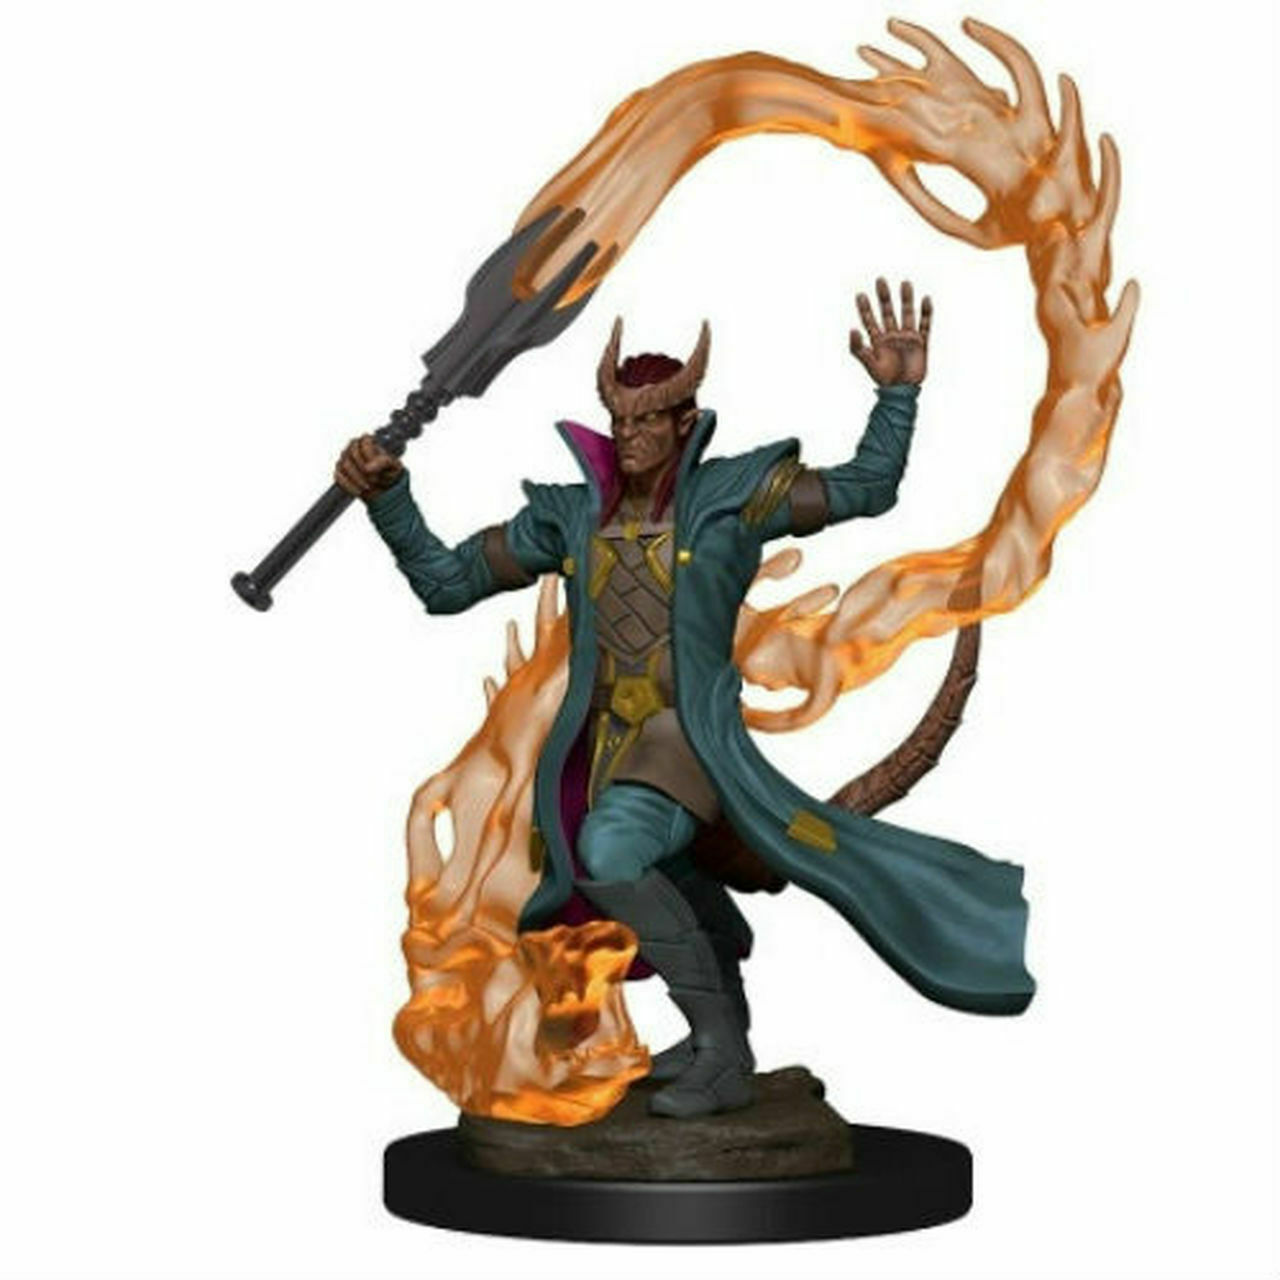 Aasimar Sorcerer tiefling male sorcerer d&d icons of the realms premium minis wizkids  wzk73819